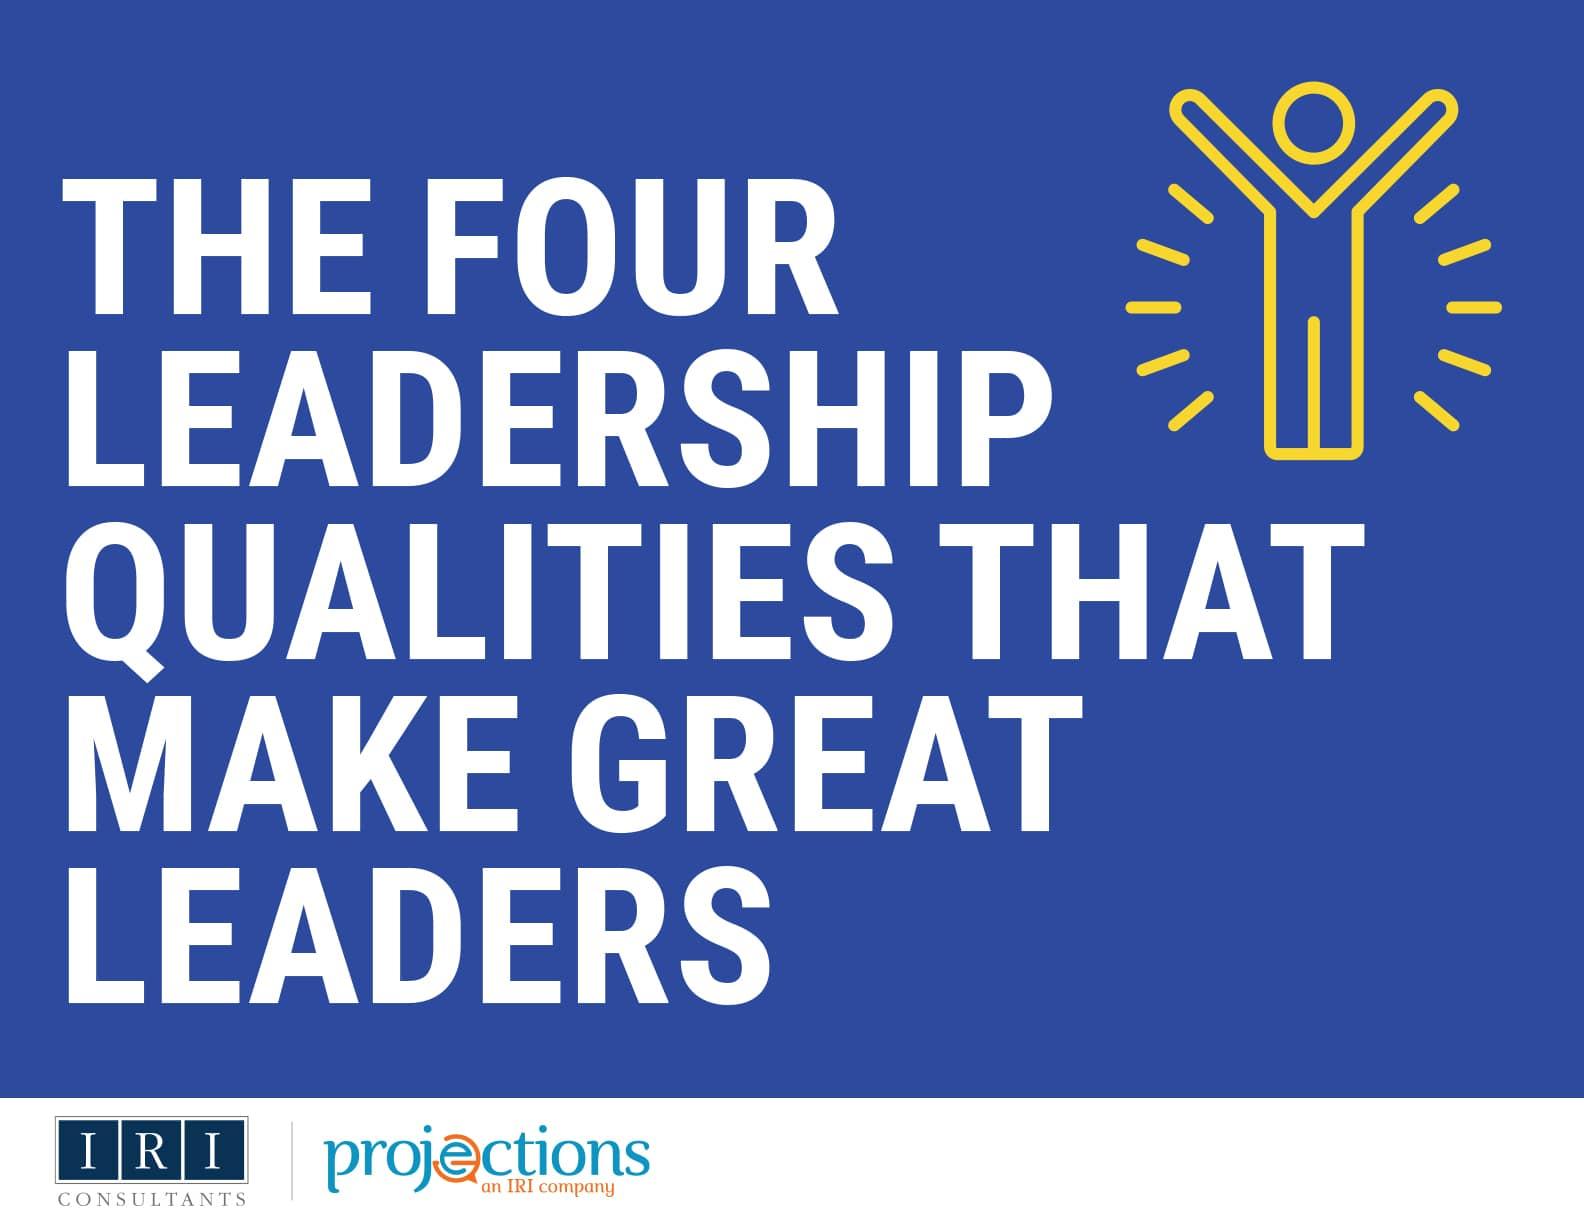 The 4 Leadership Qualities That Make Great Leaders